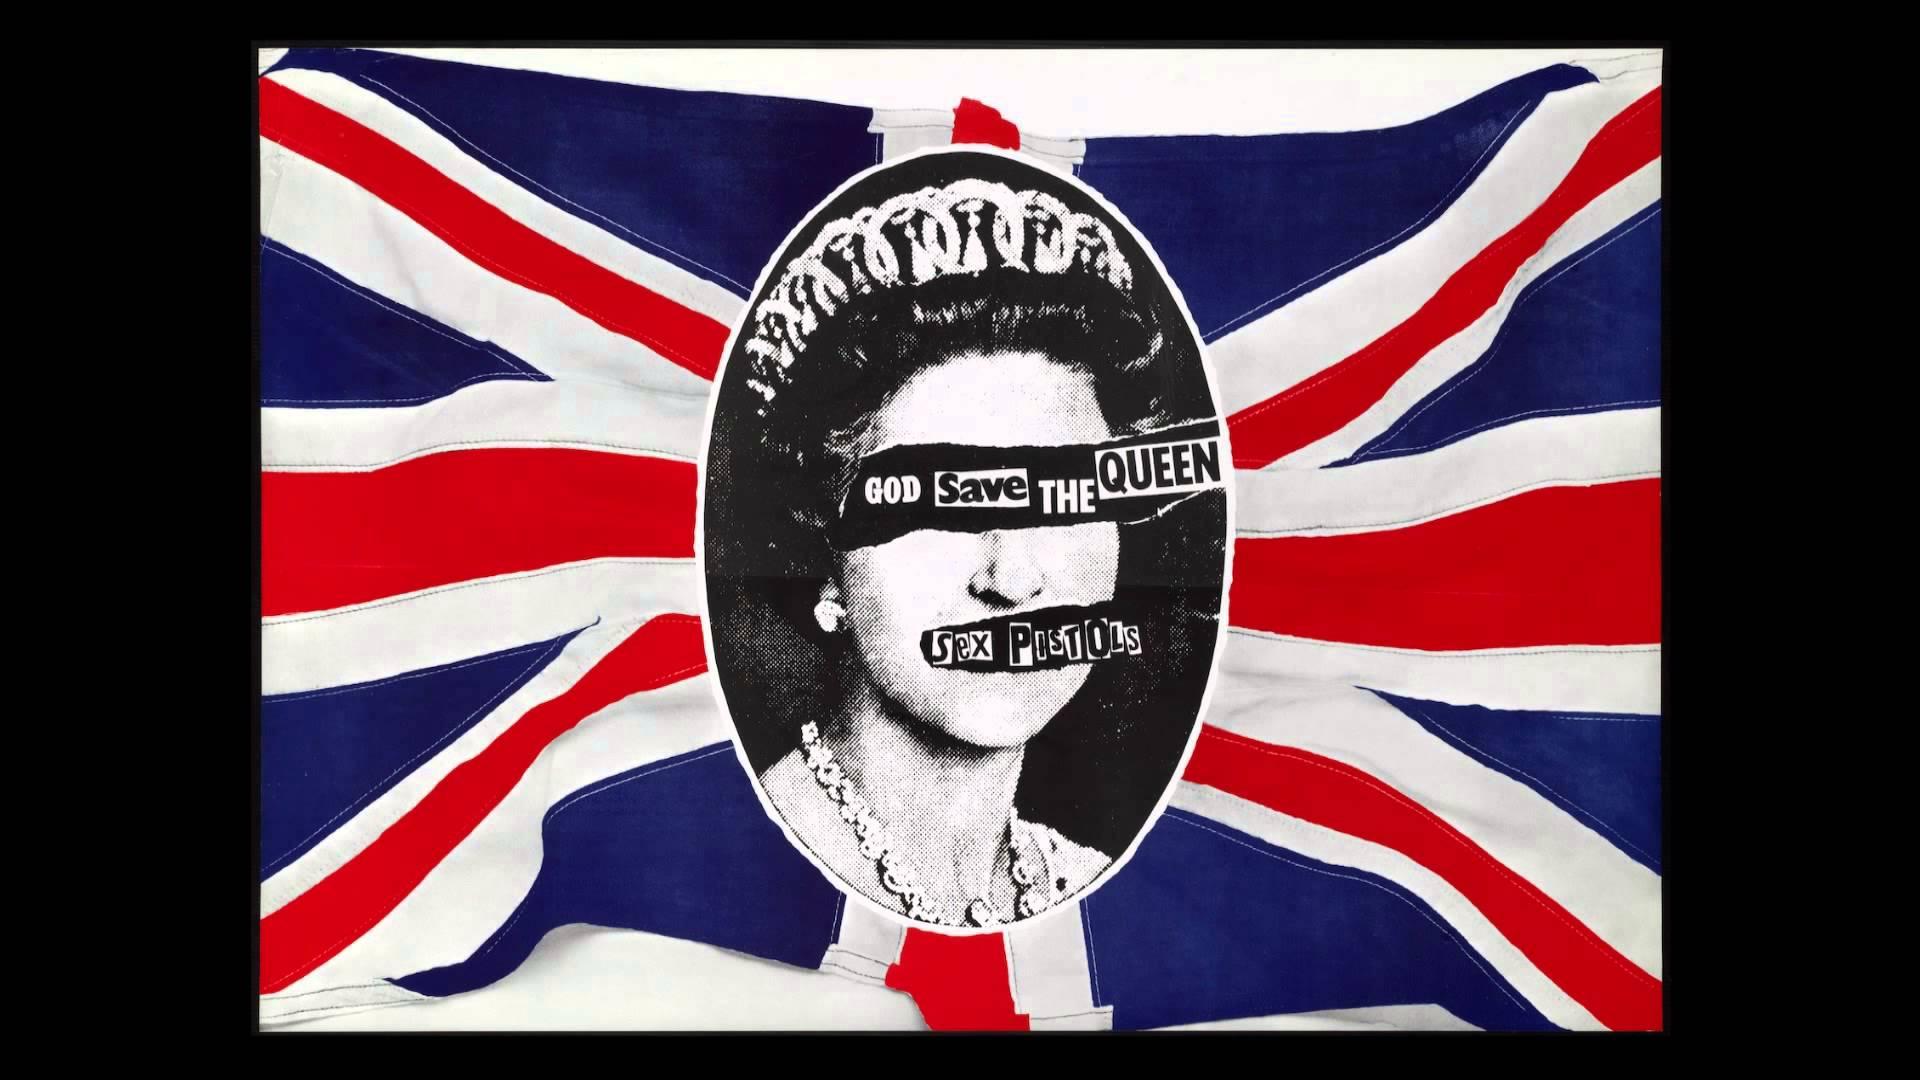 Sex Pistols God save the queen sex cam